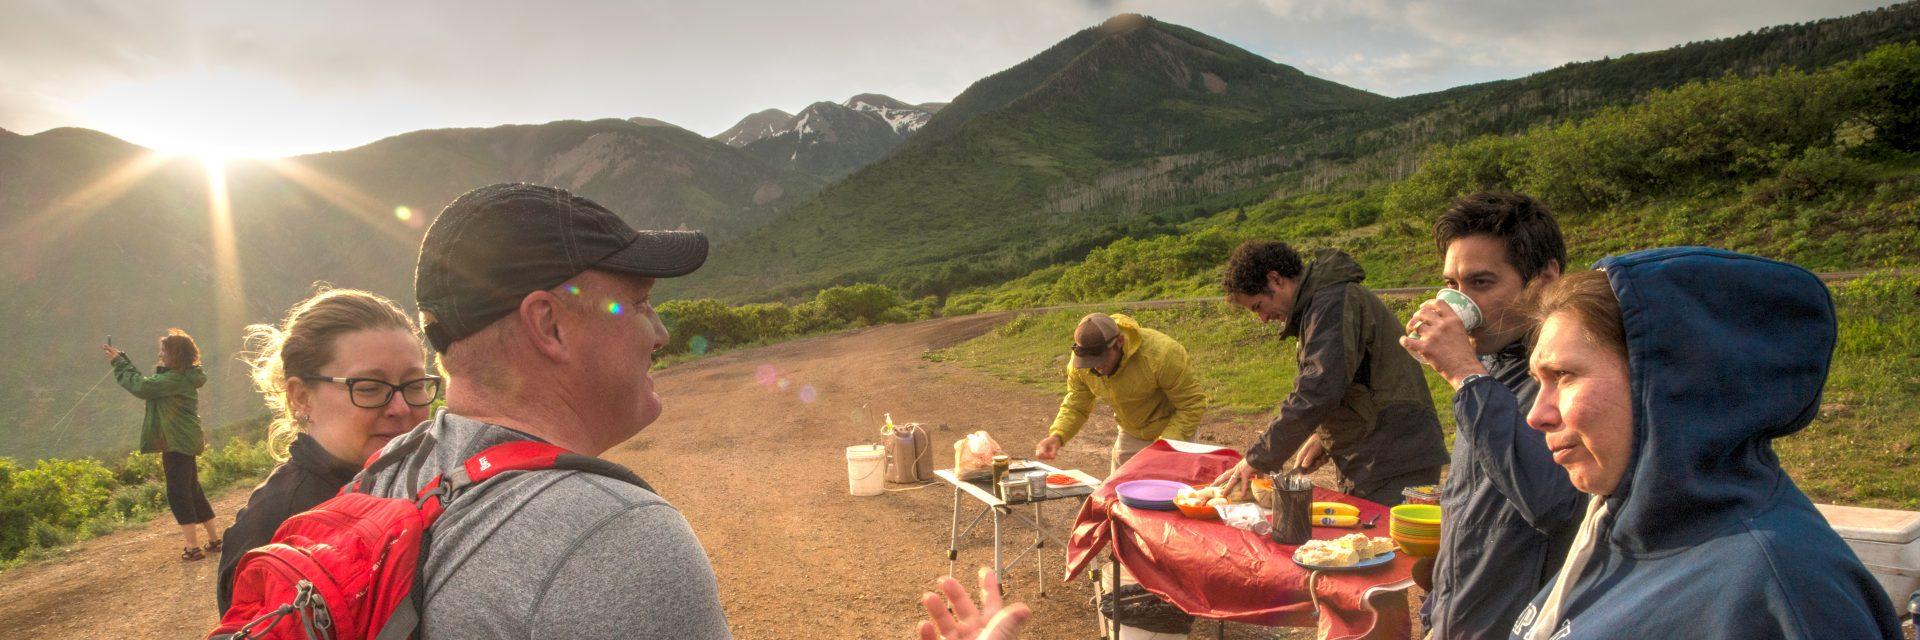 Breakfast preparations, Sunrise Downhill guided mountain bike tour, Moab, UT beginners welcome!